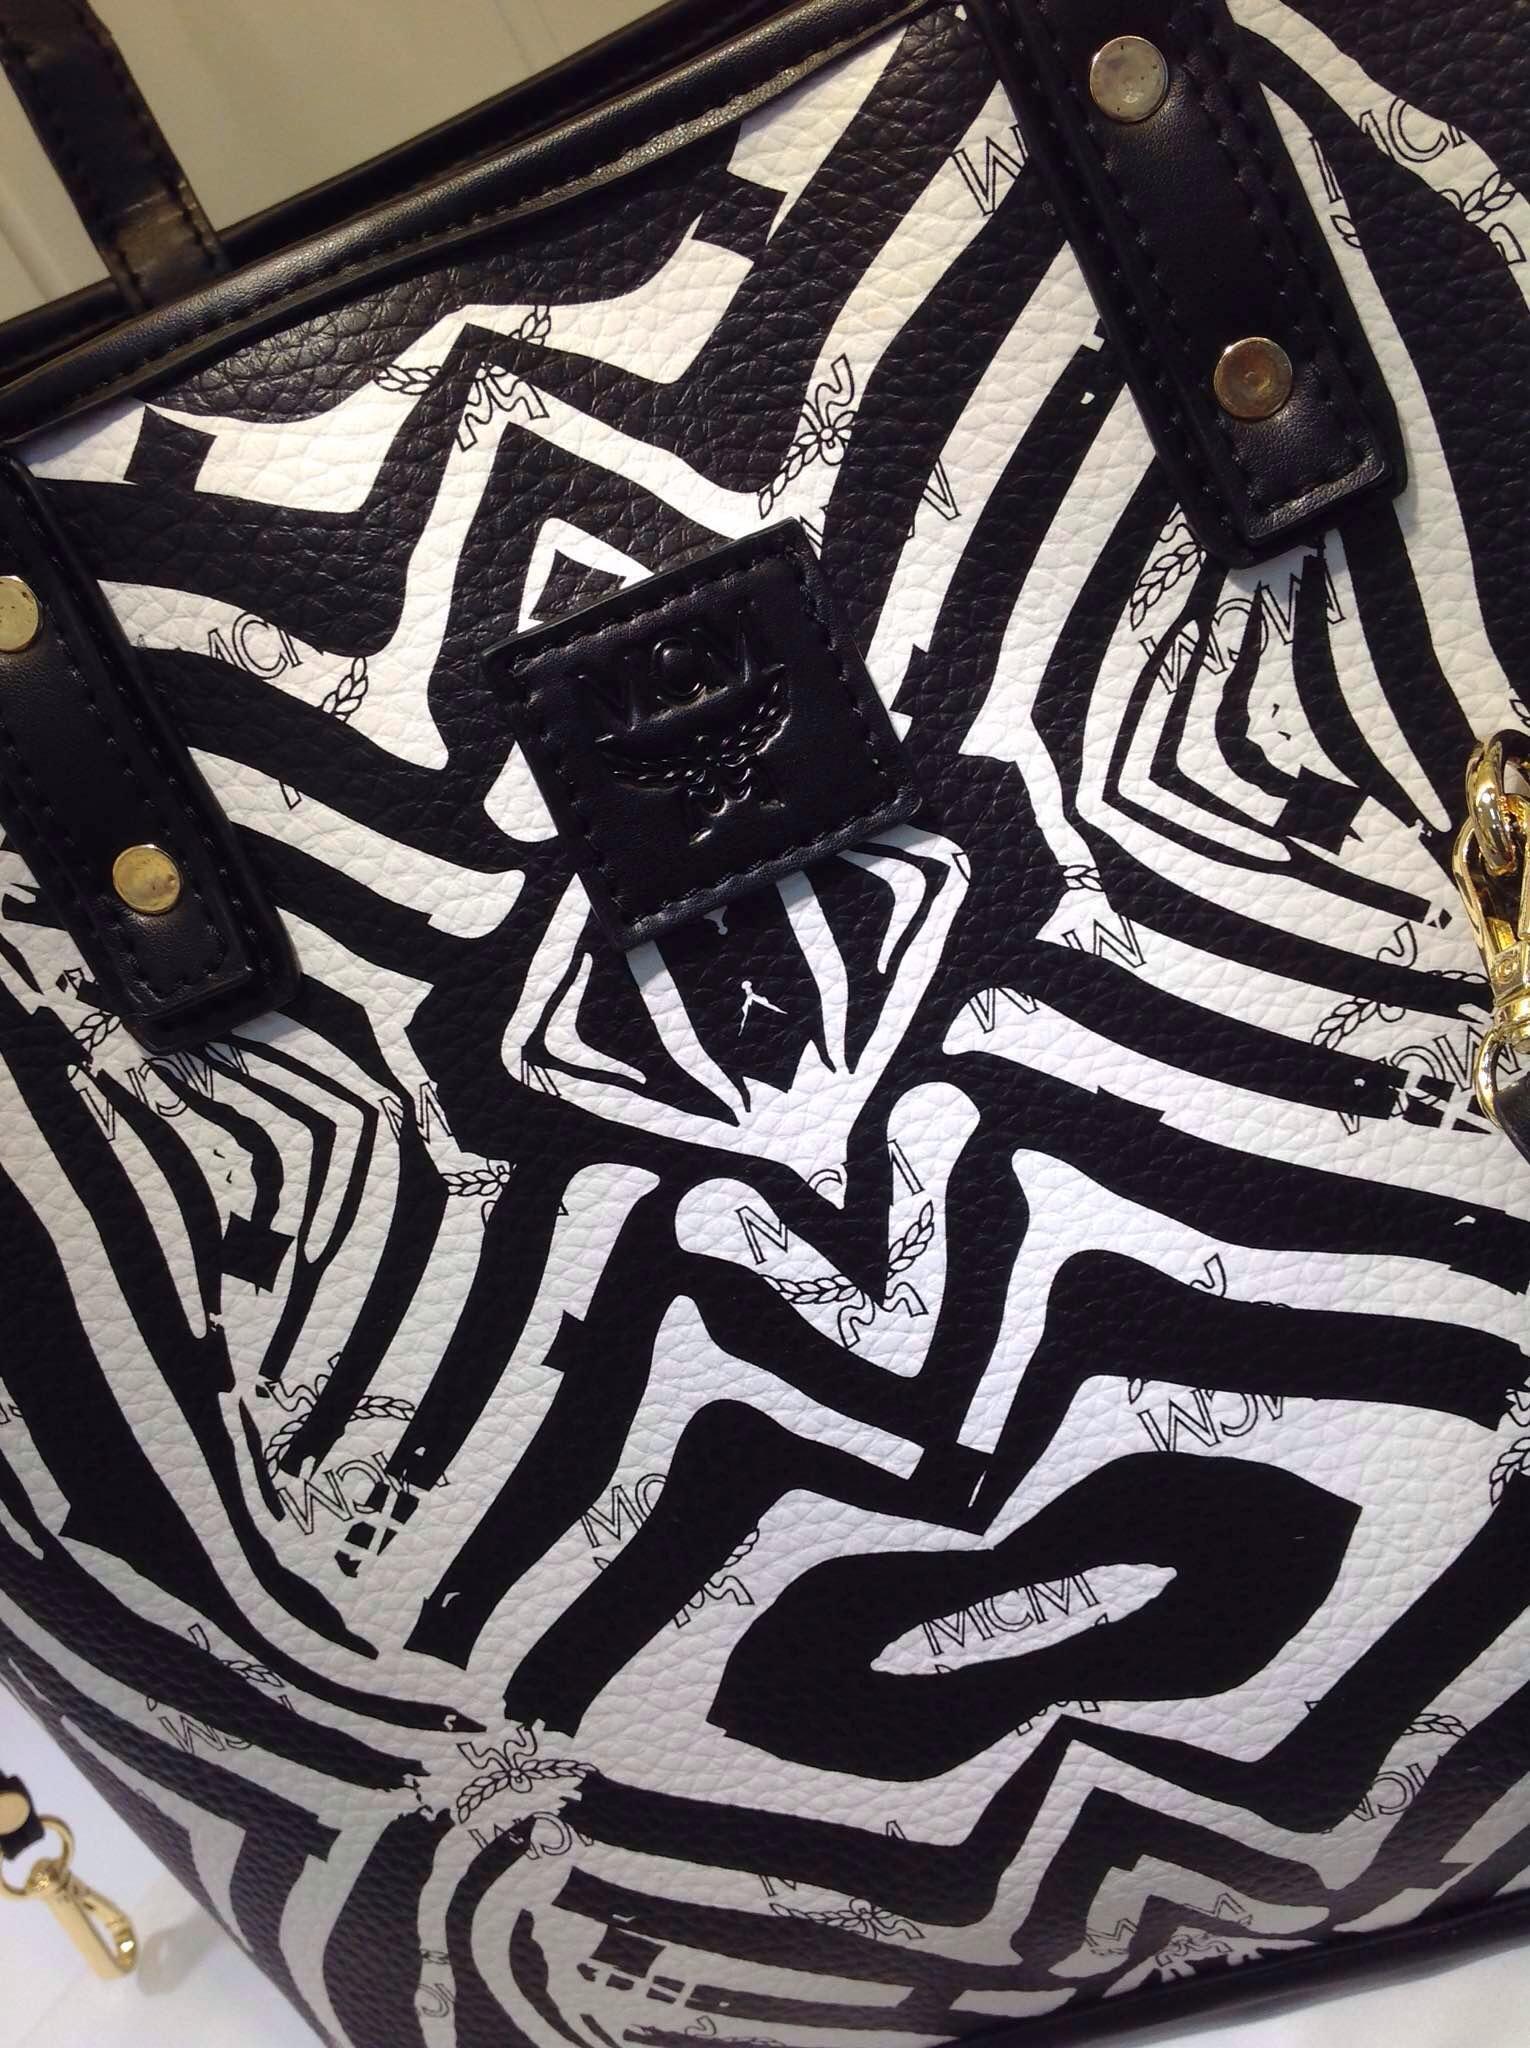 MCM专柜新款 白色纹子母购物袋 一件代发 厂家直销